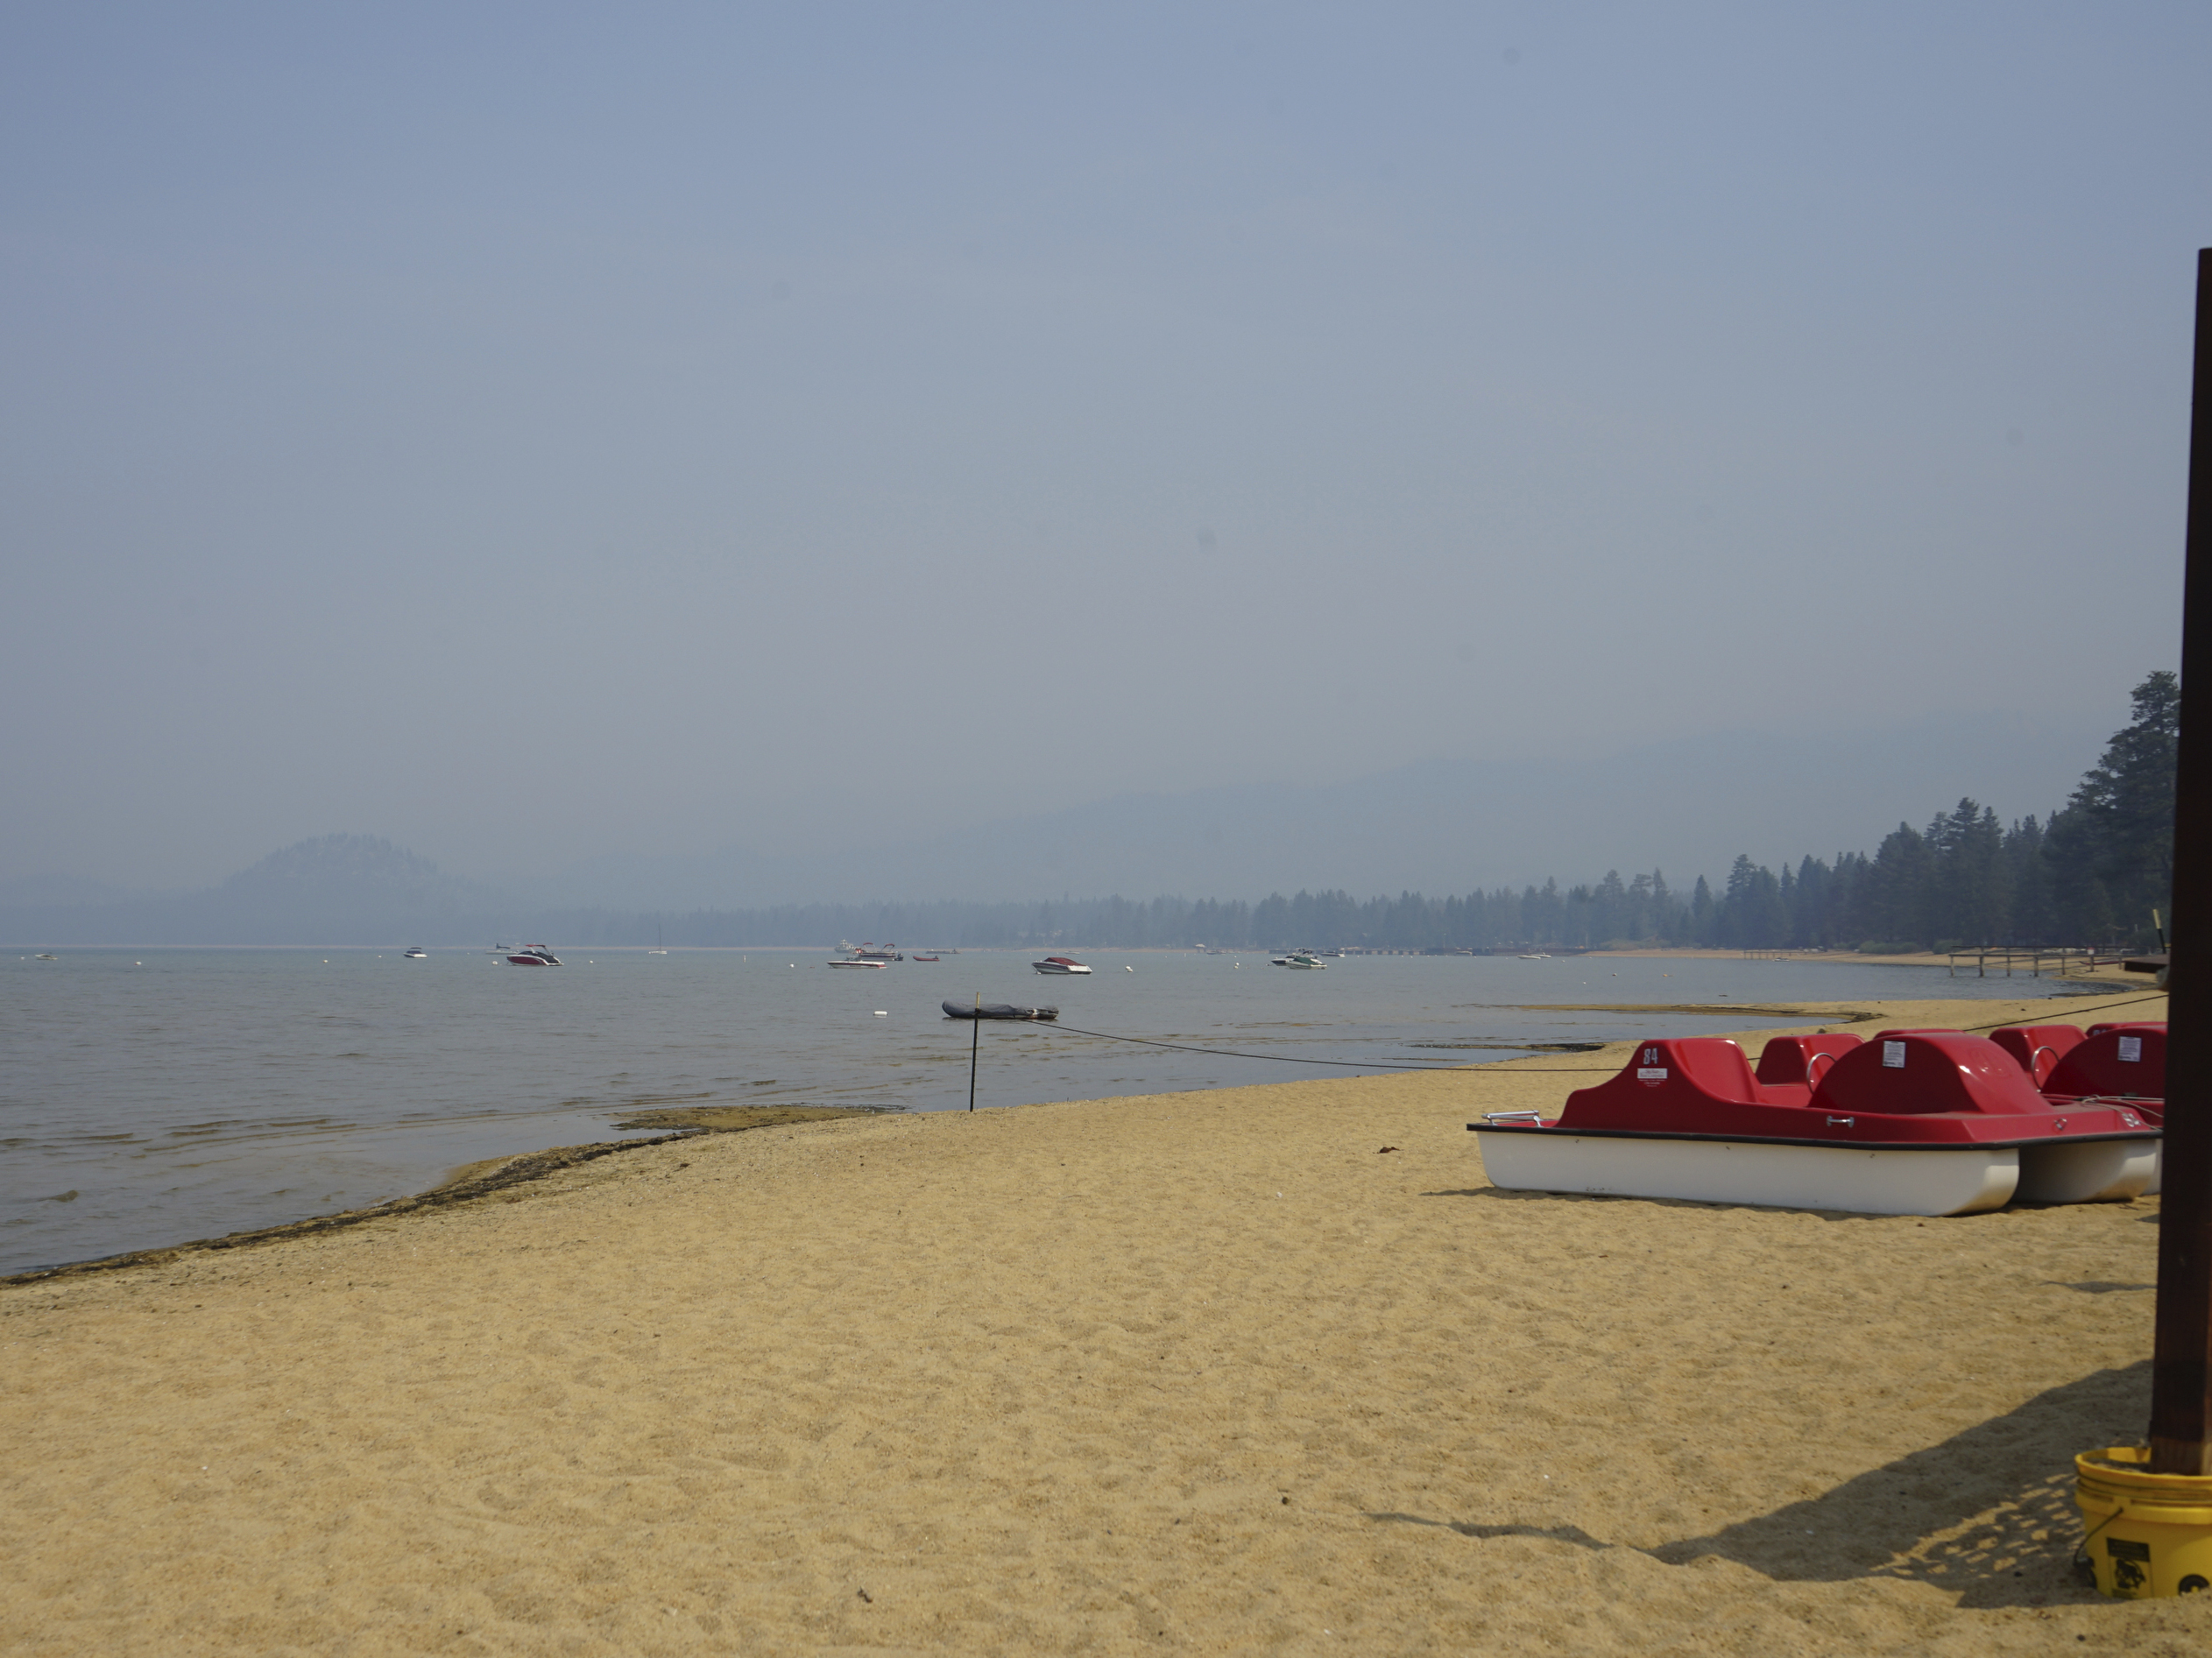 Smoke shrouds parts of Lake Tahoe visible from the Ski Run Marina in downtown South Lake Tahoe on Monday.